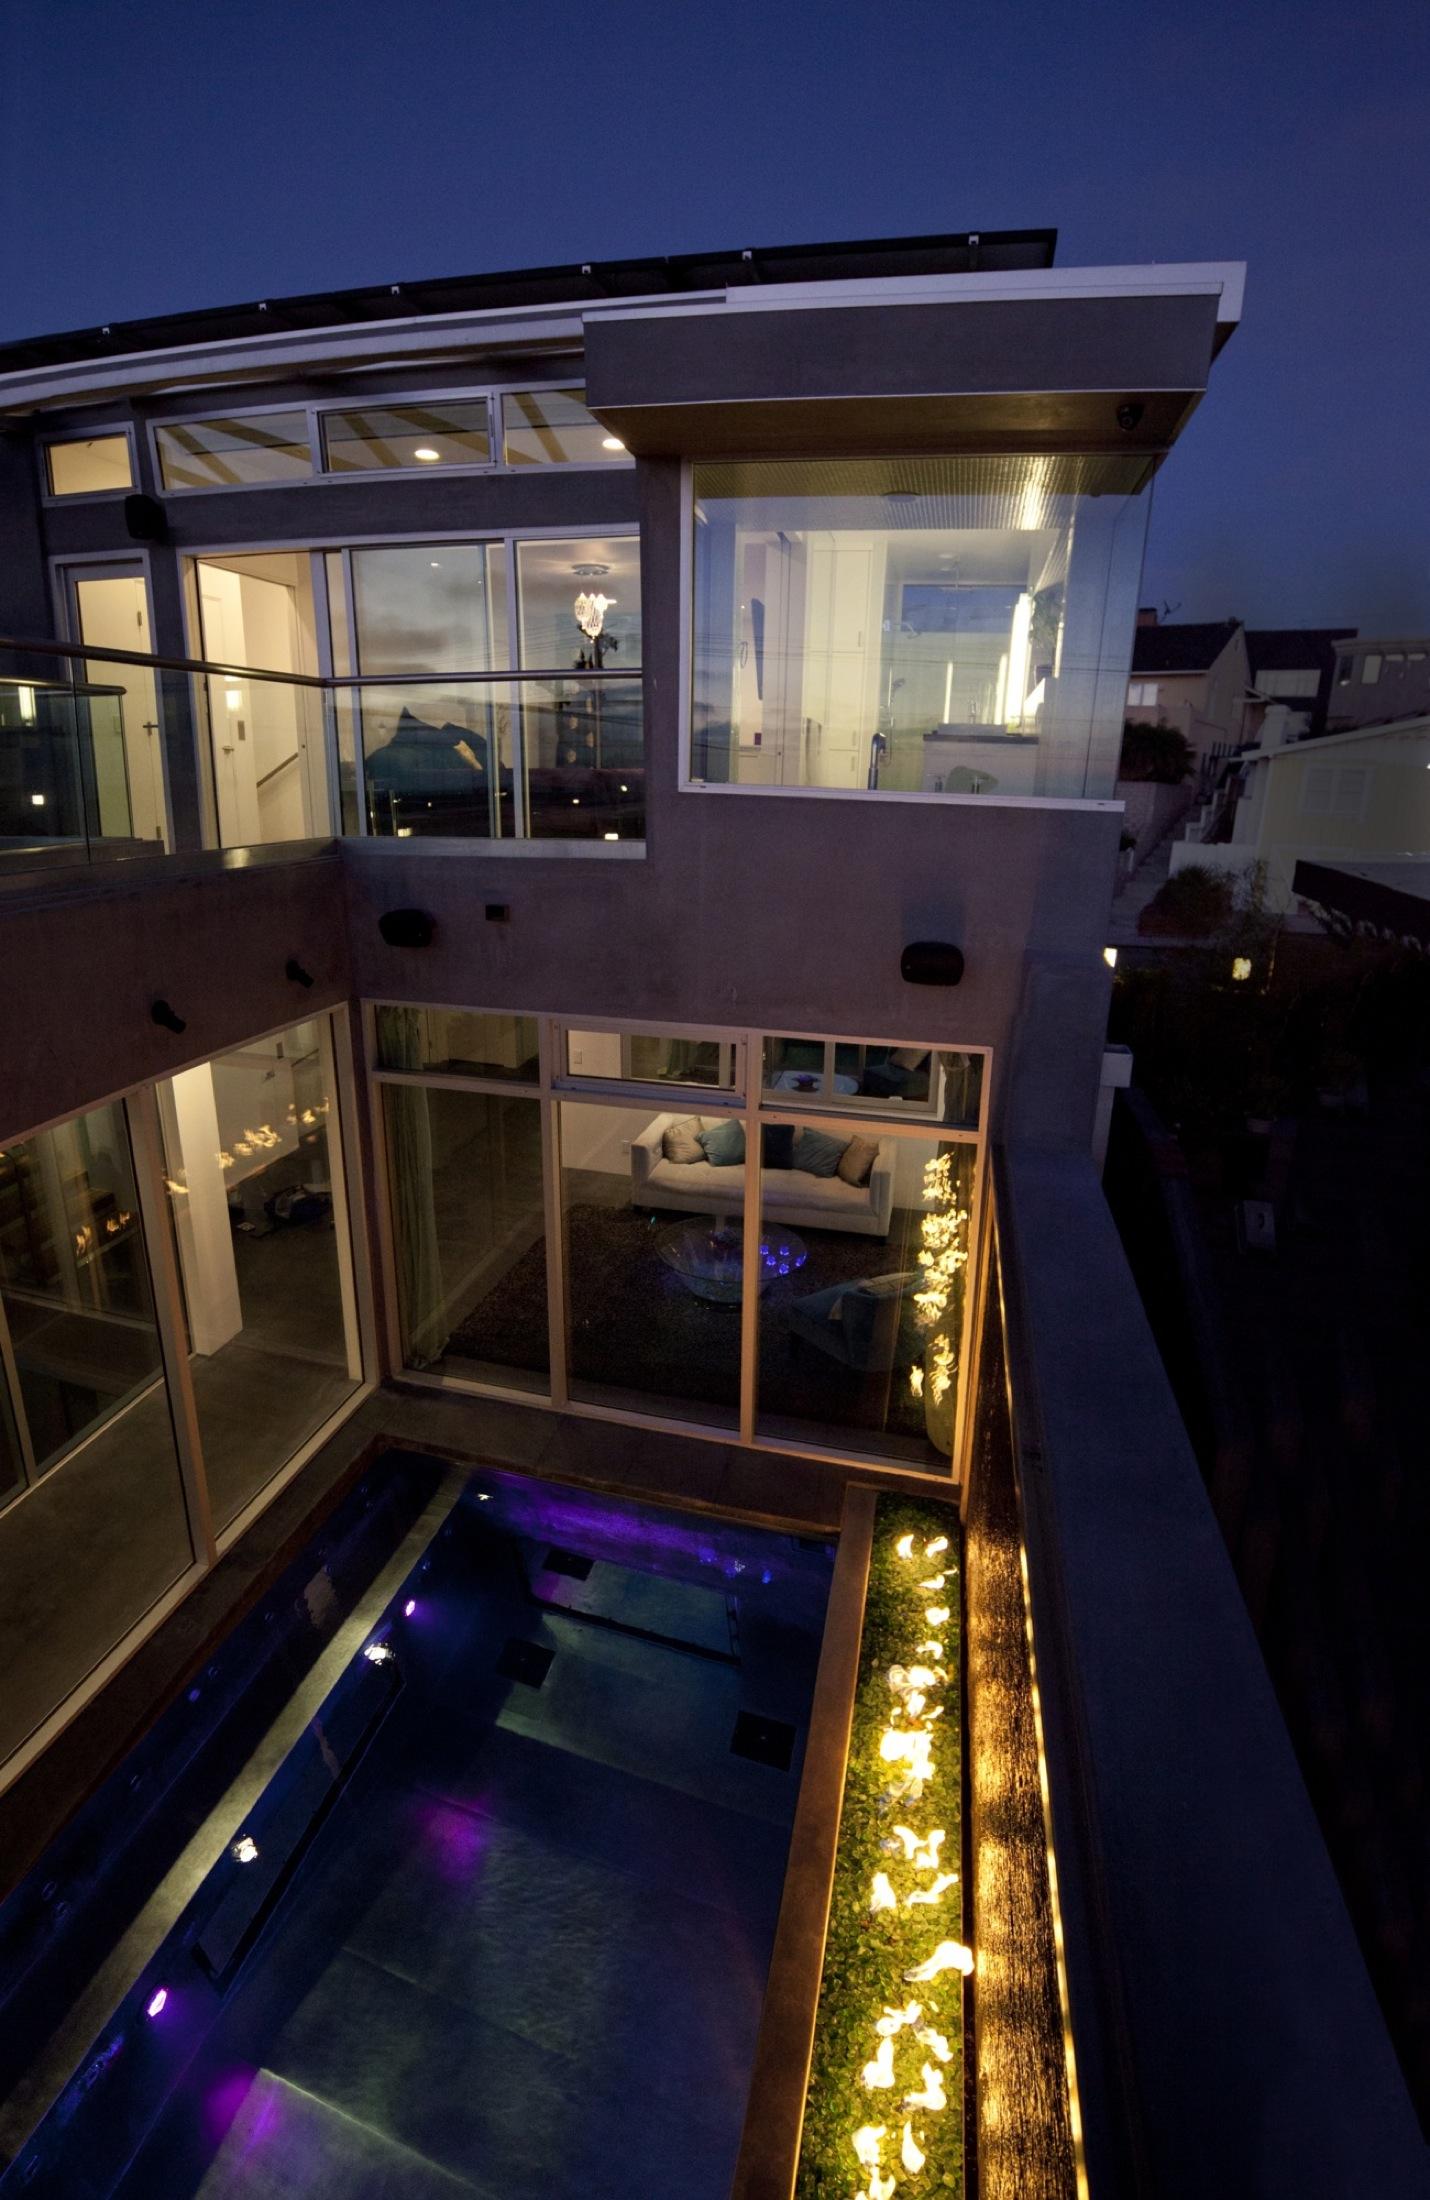 Carson-Leh-Hermosa-House-night-pool-fire small.jpg